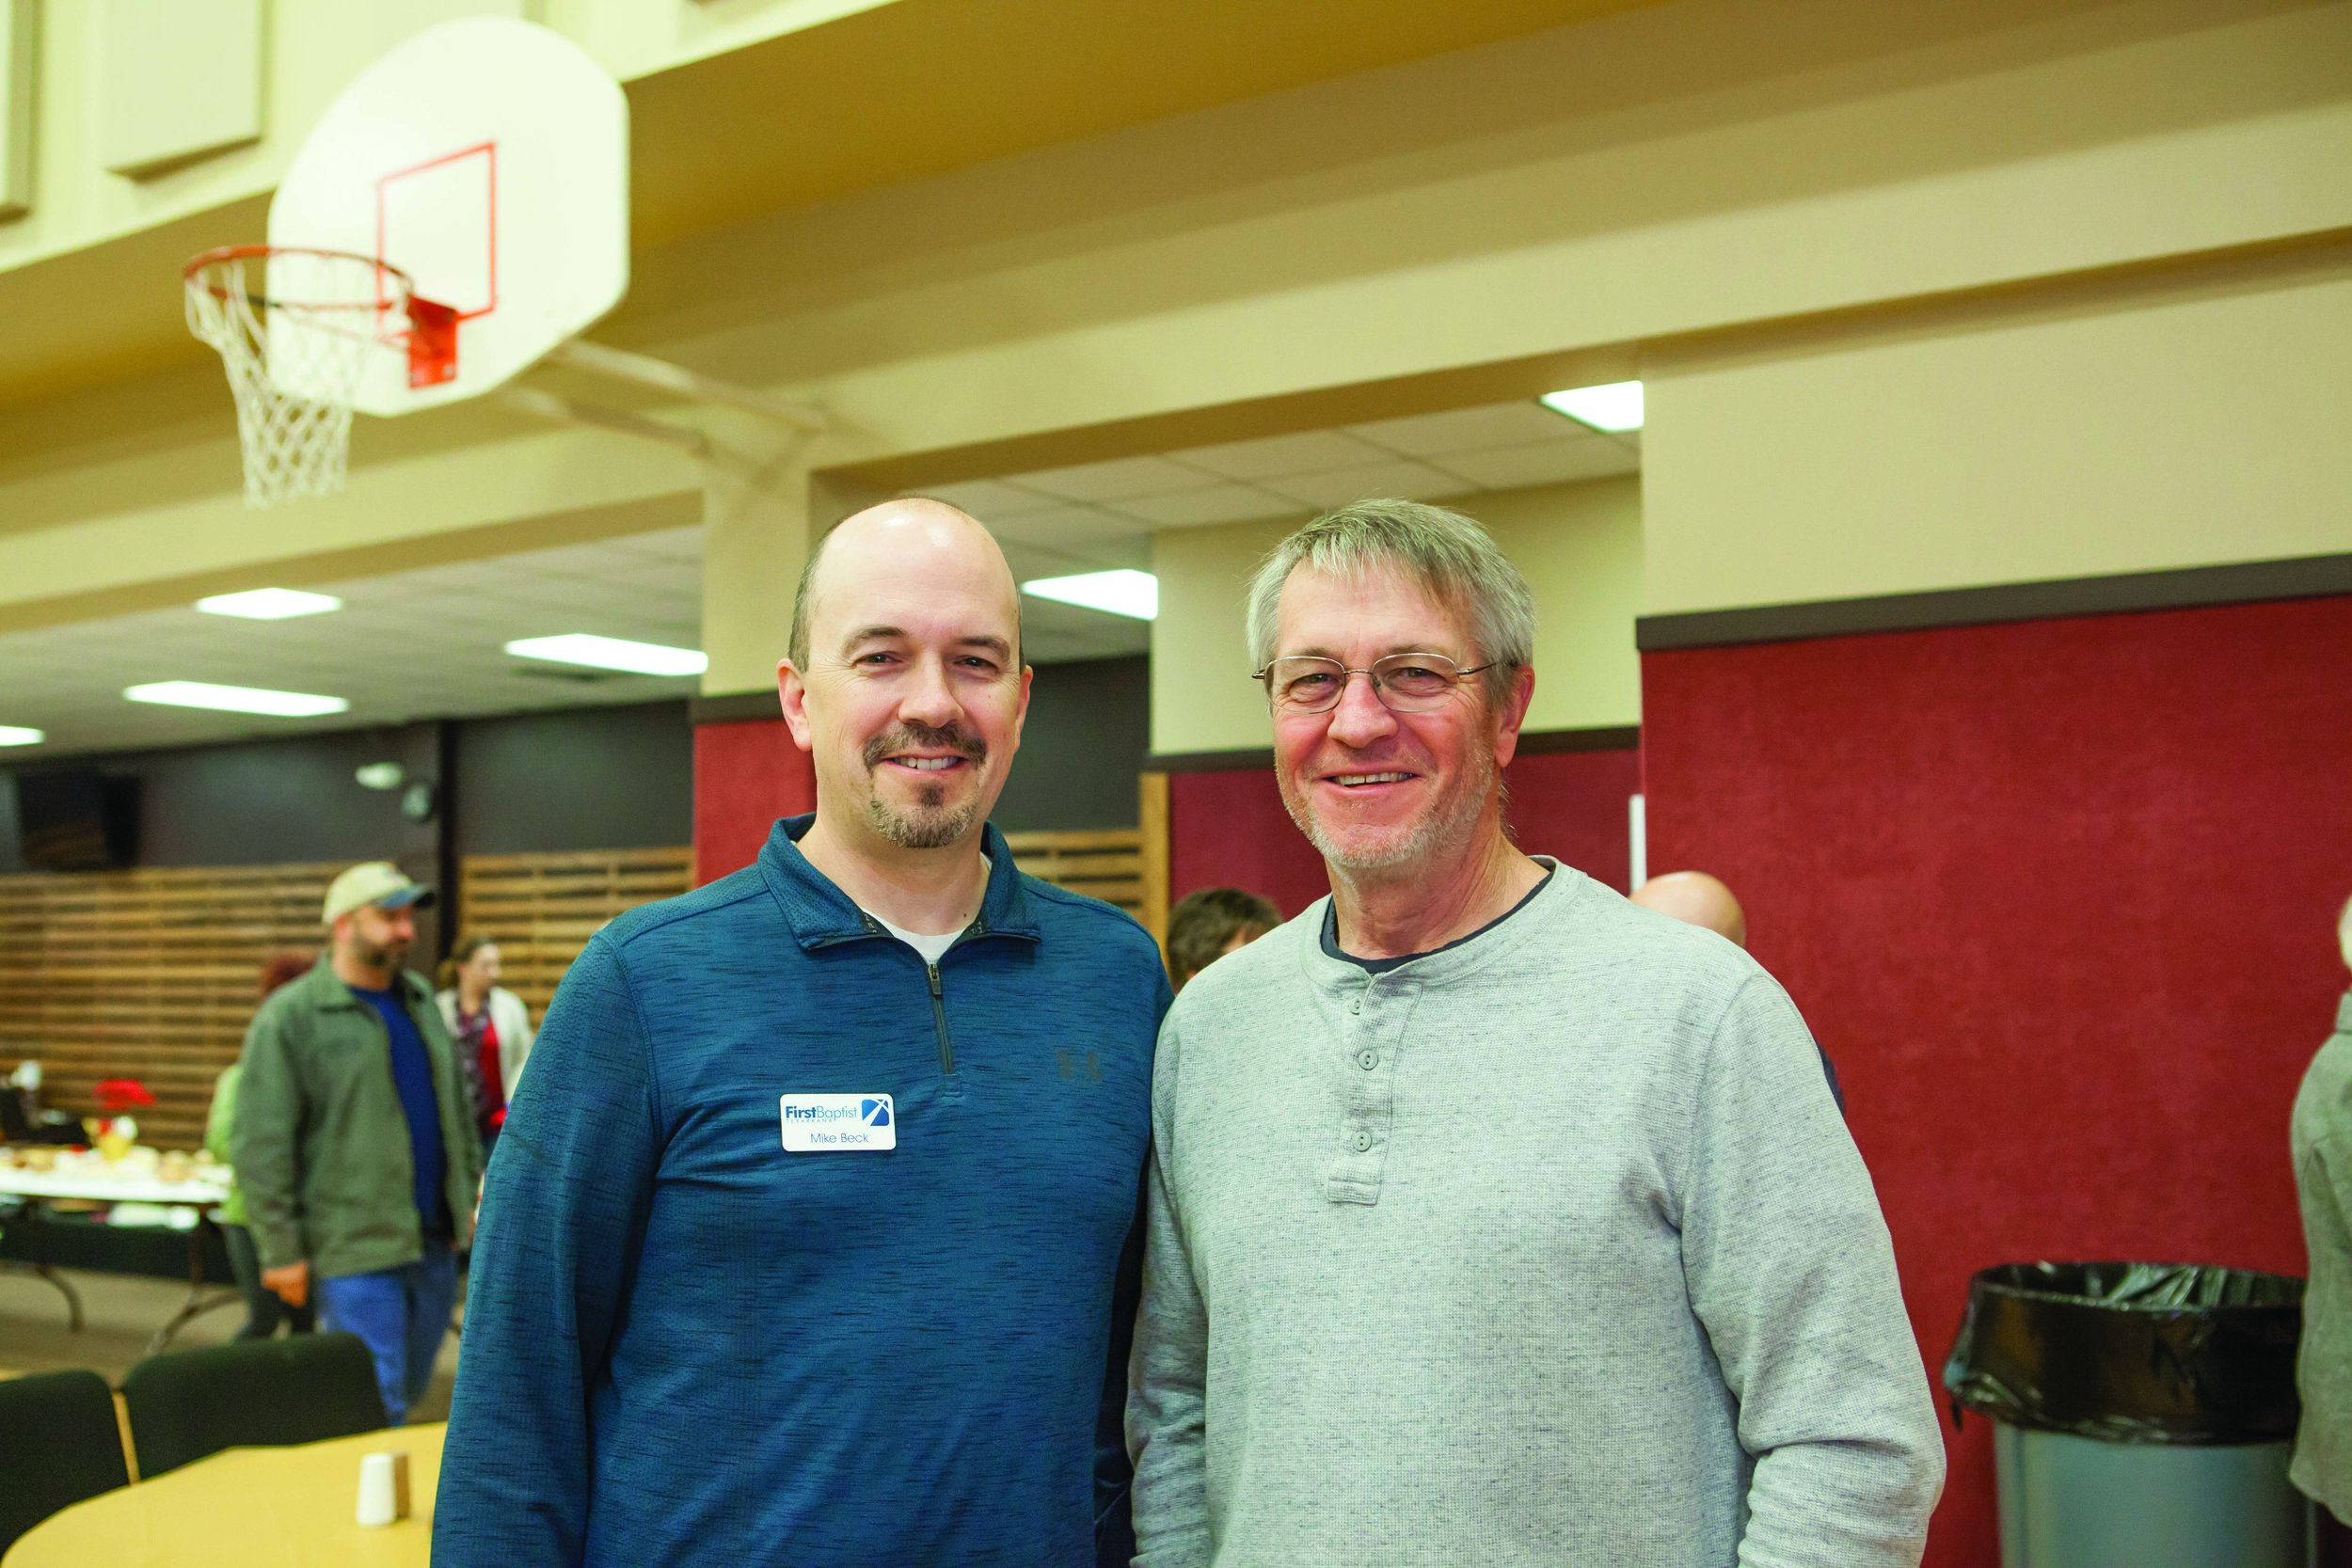 Mike Beck and Brisco Davis